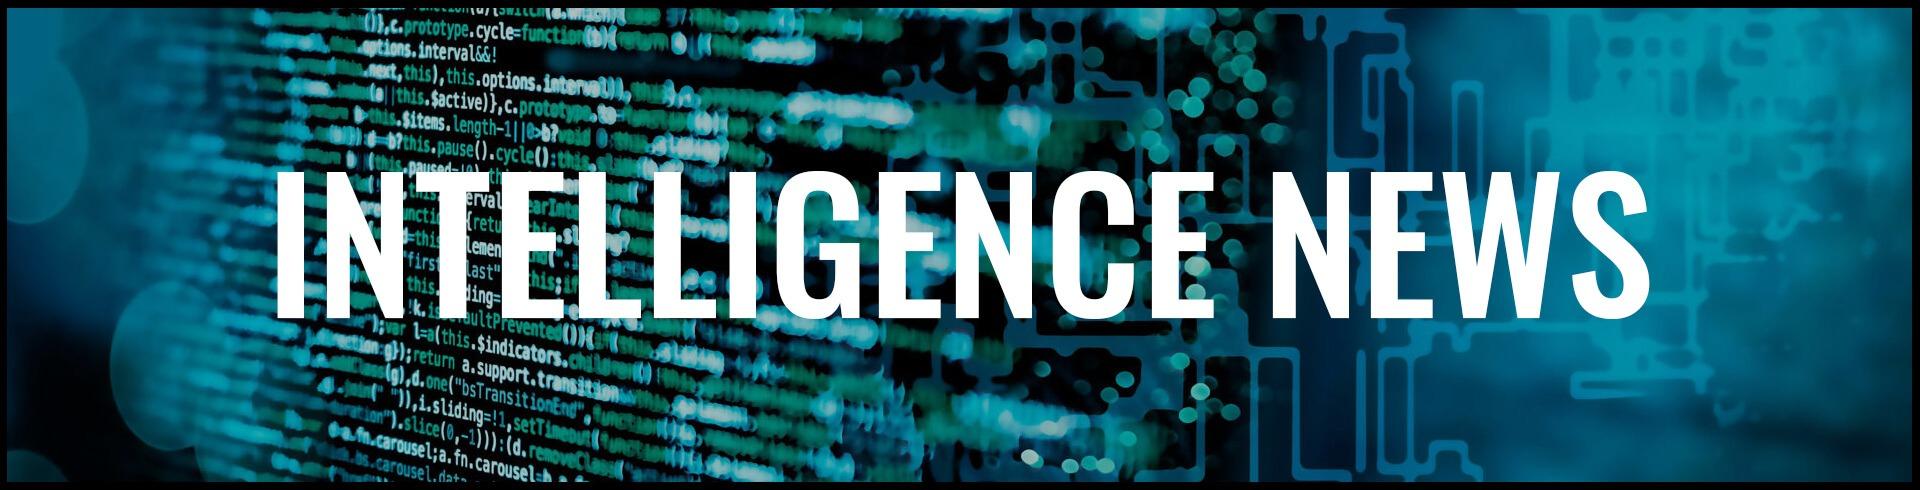 Intelligence-news-Great-Awakening-Report